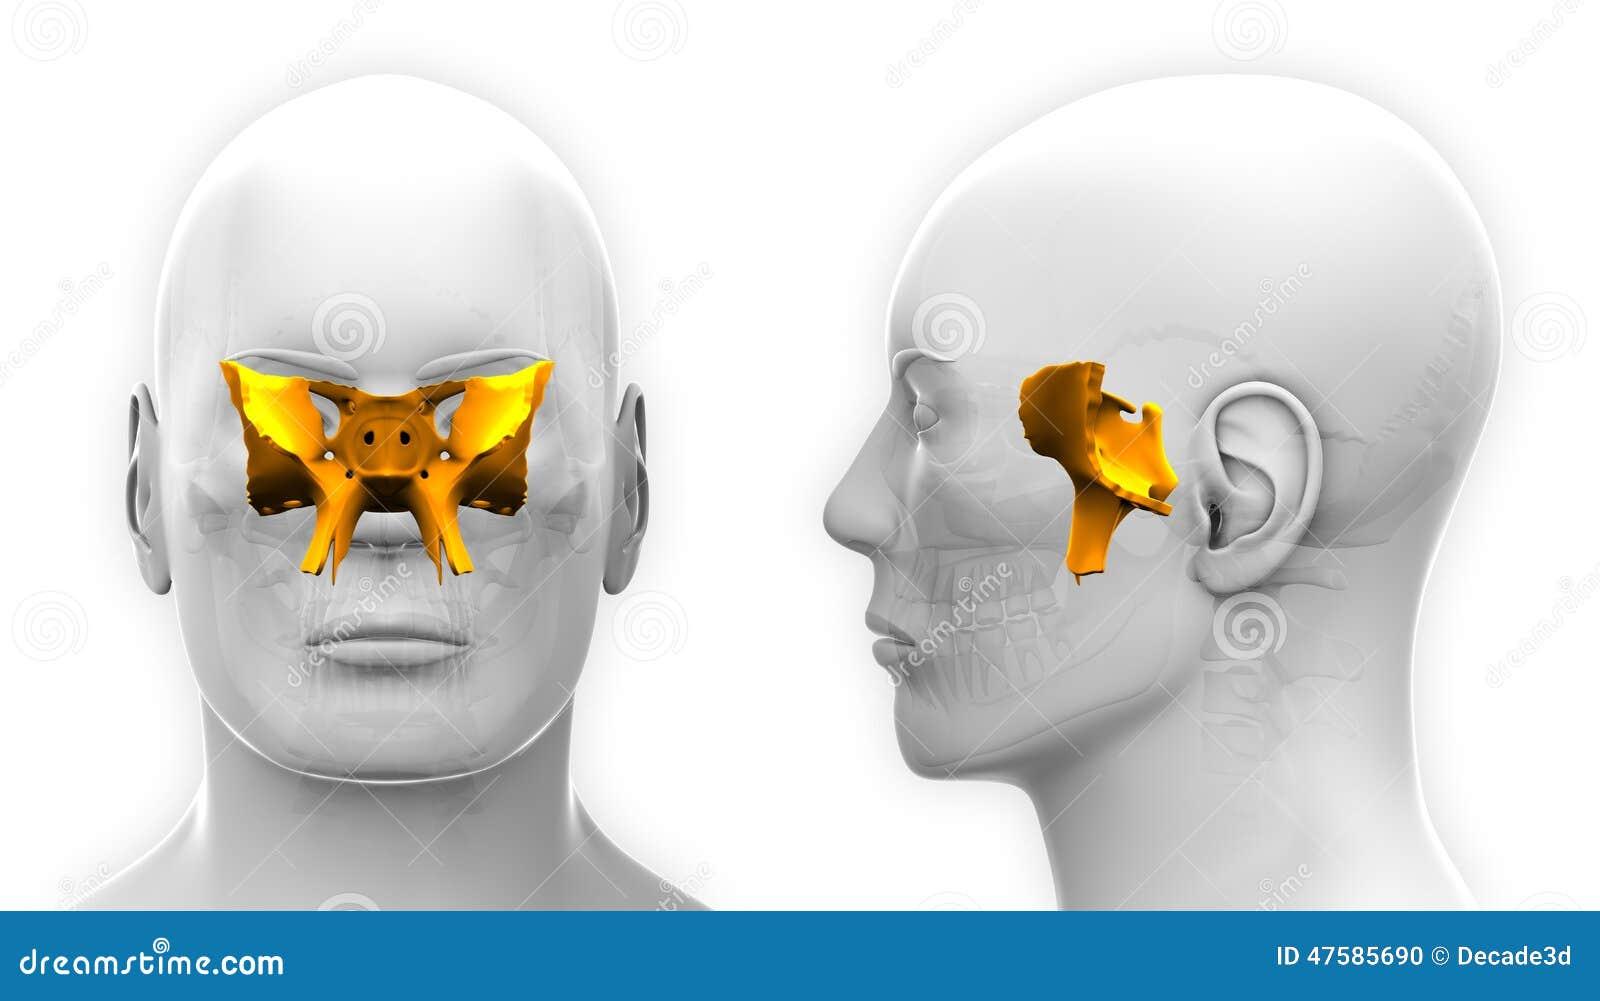 sphenoid bone - skull / cranium anatomy stock illustration - image, Human body